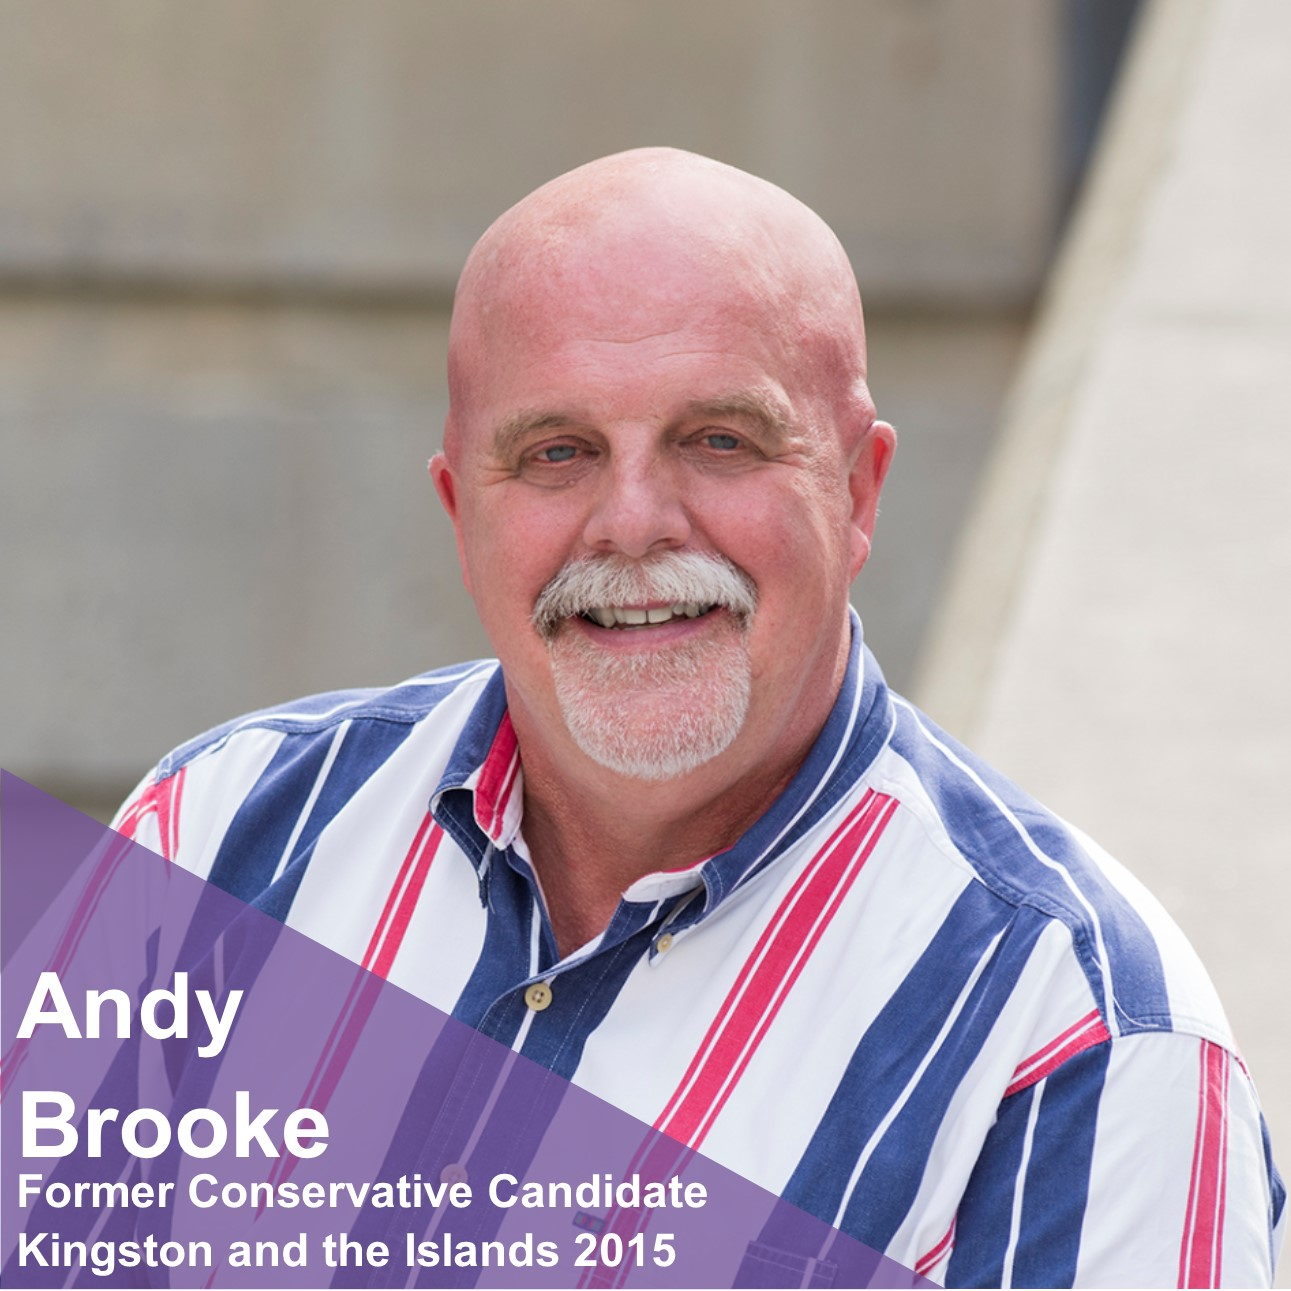 AndyBrookeW.jpg